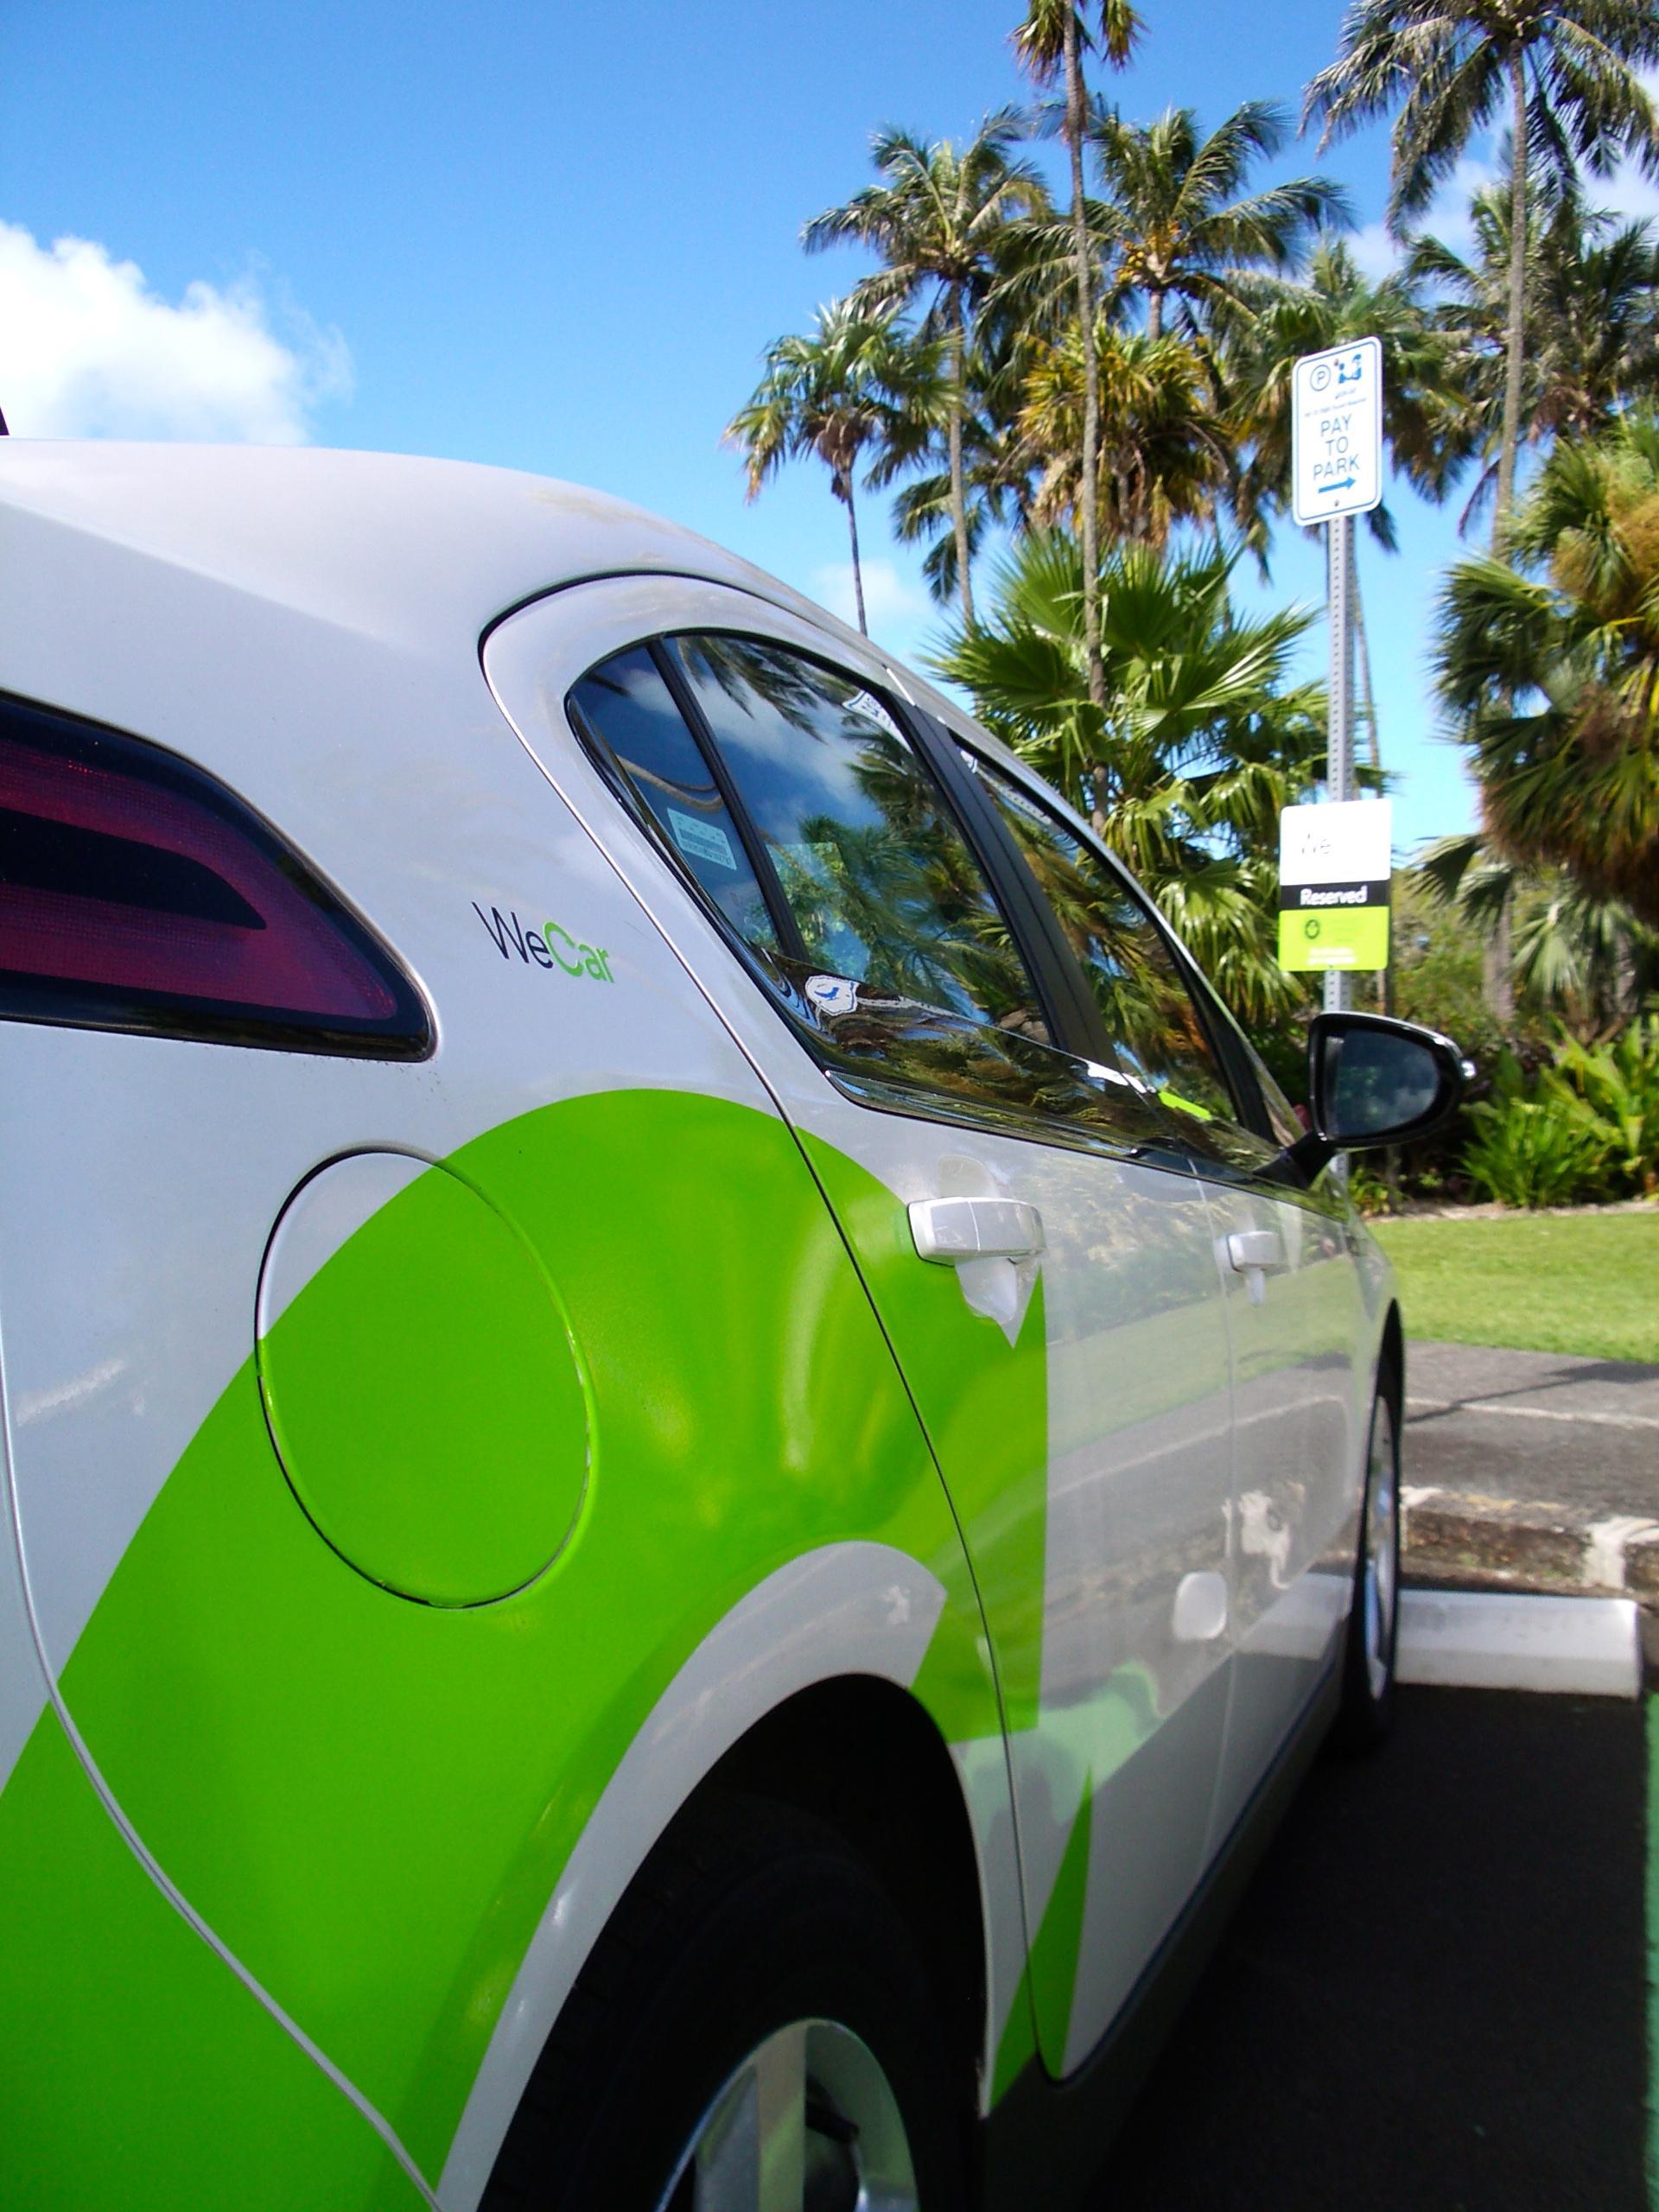 Mānoa: WeCar By Enterprise Car-sharing Comes To UH Manoa